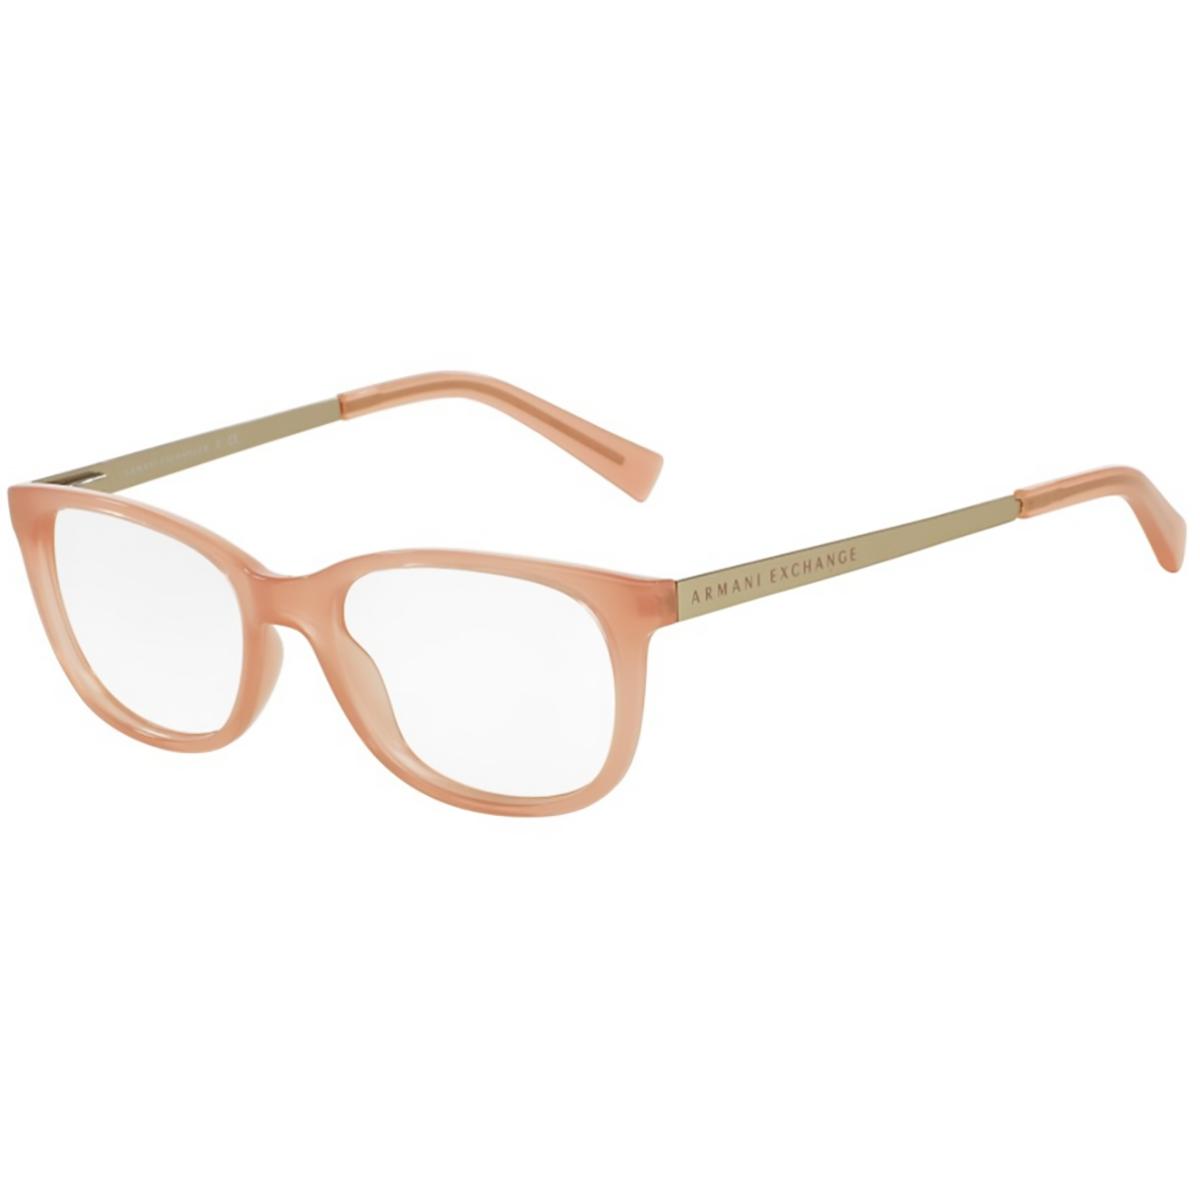 5065164a6 Compre Óculos de Grau Armani Exchange em 10X   Tri-Jóia Shop